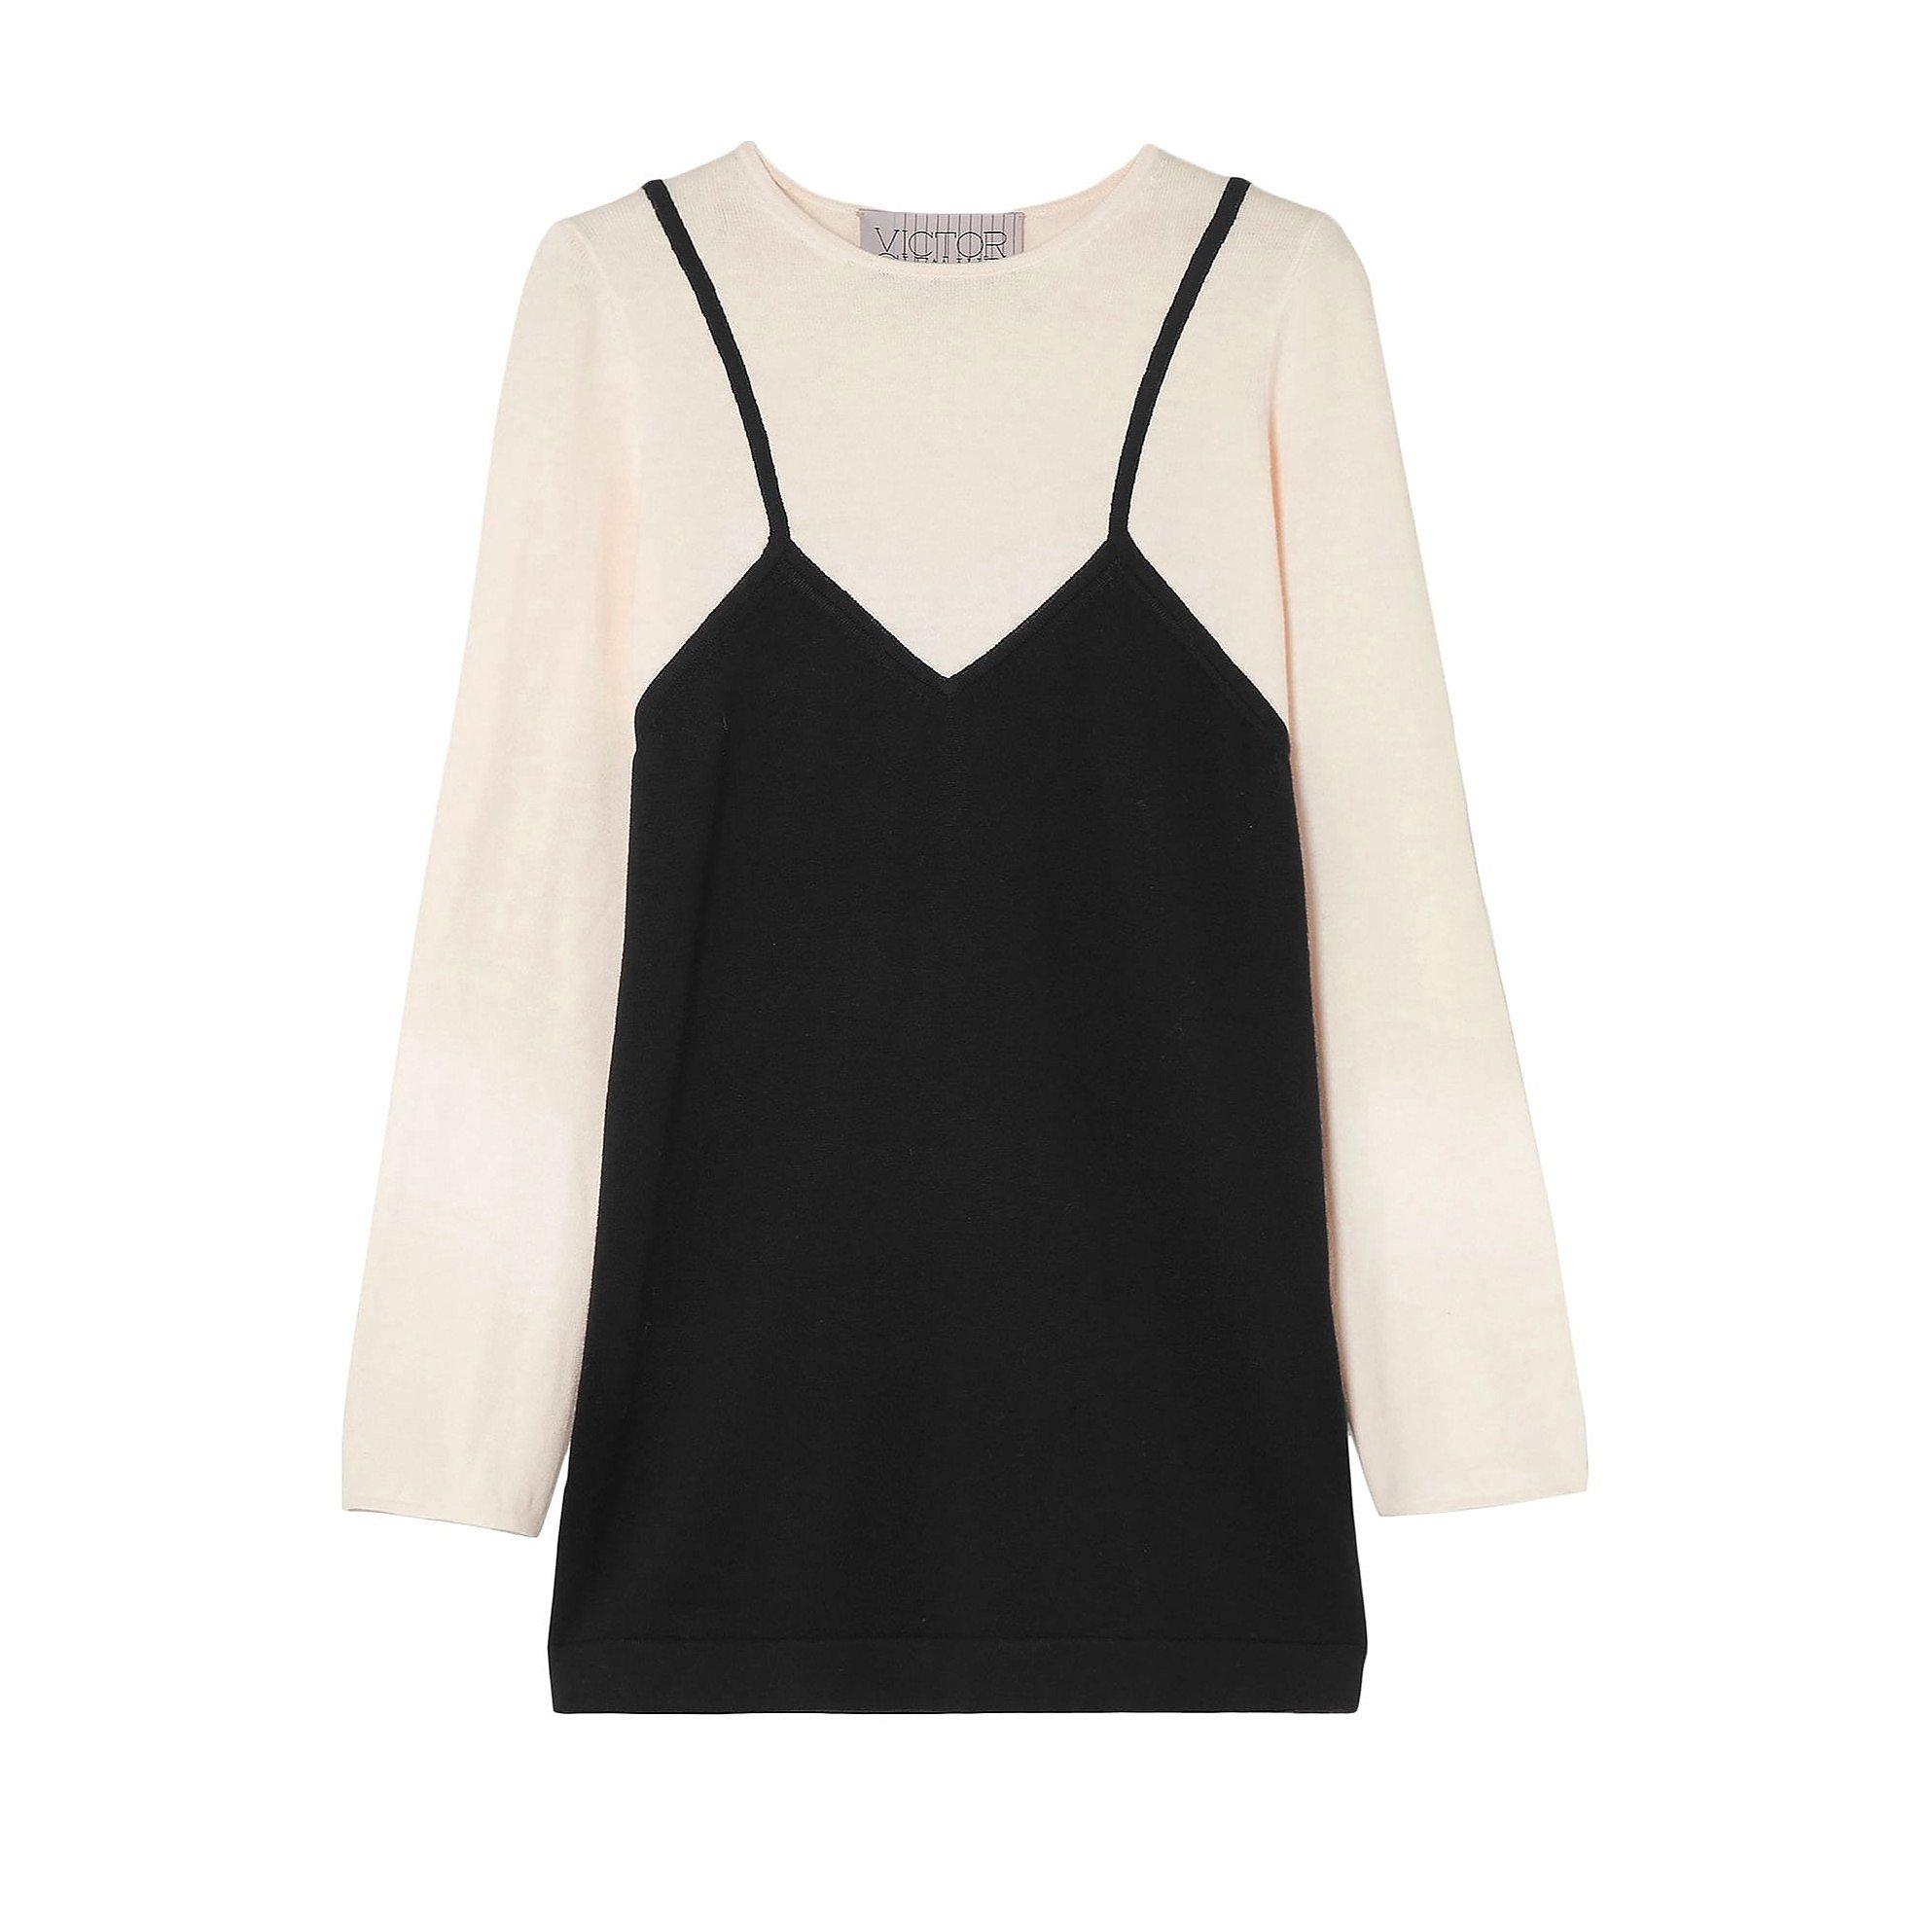 Victor Glemaud Two-Tone Mini Dress